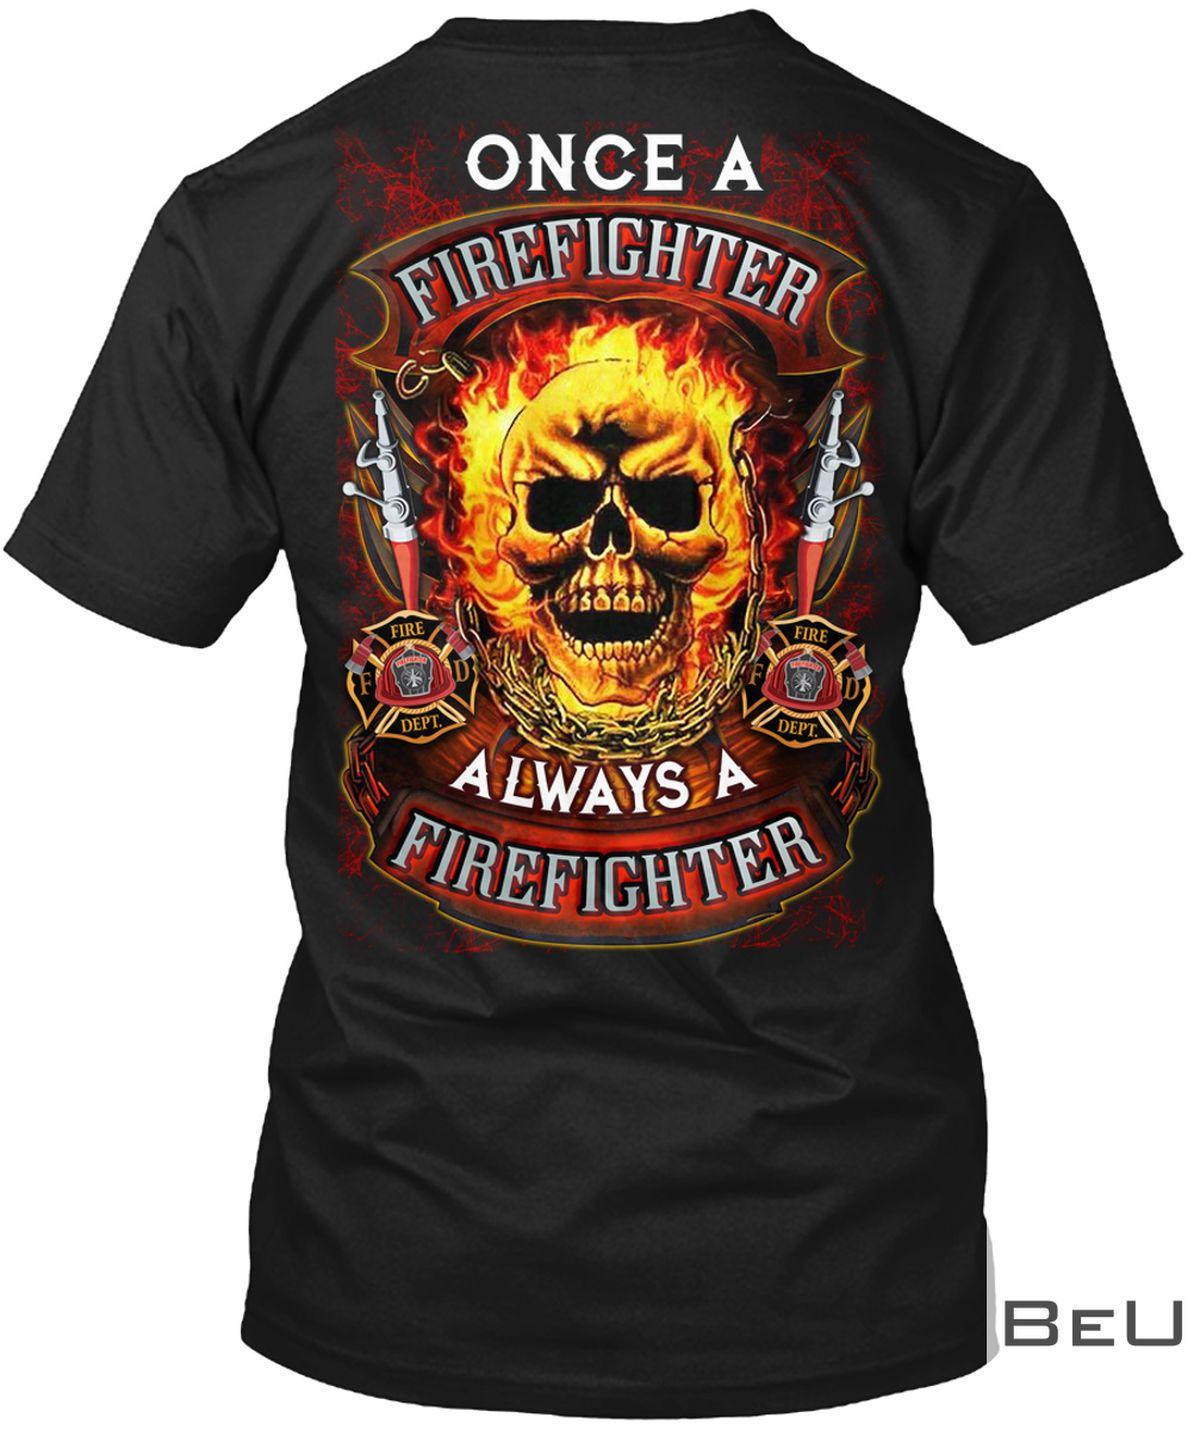 Once A Firefighter Always A Firefighter Shirt, hoodie